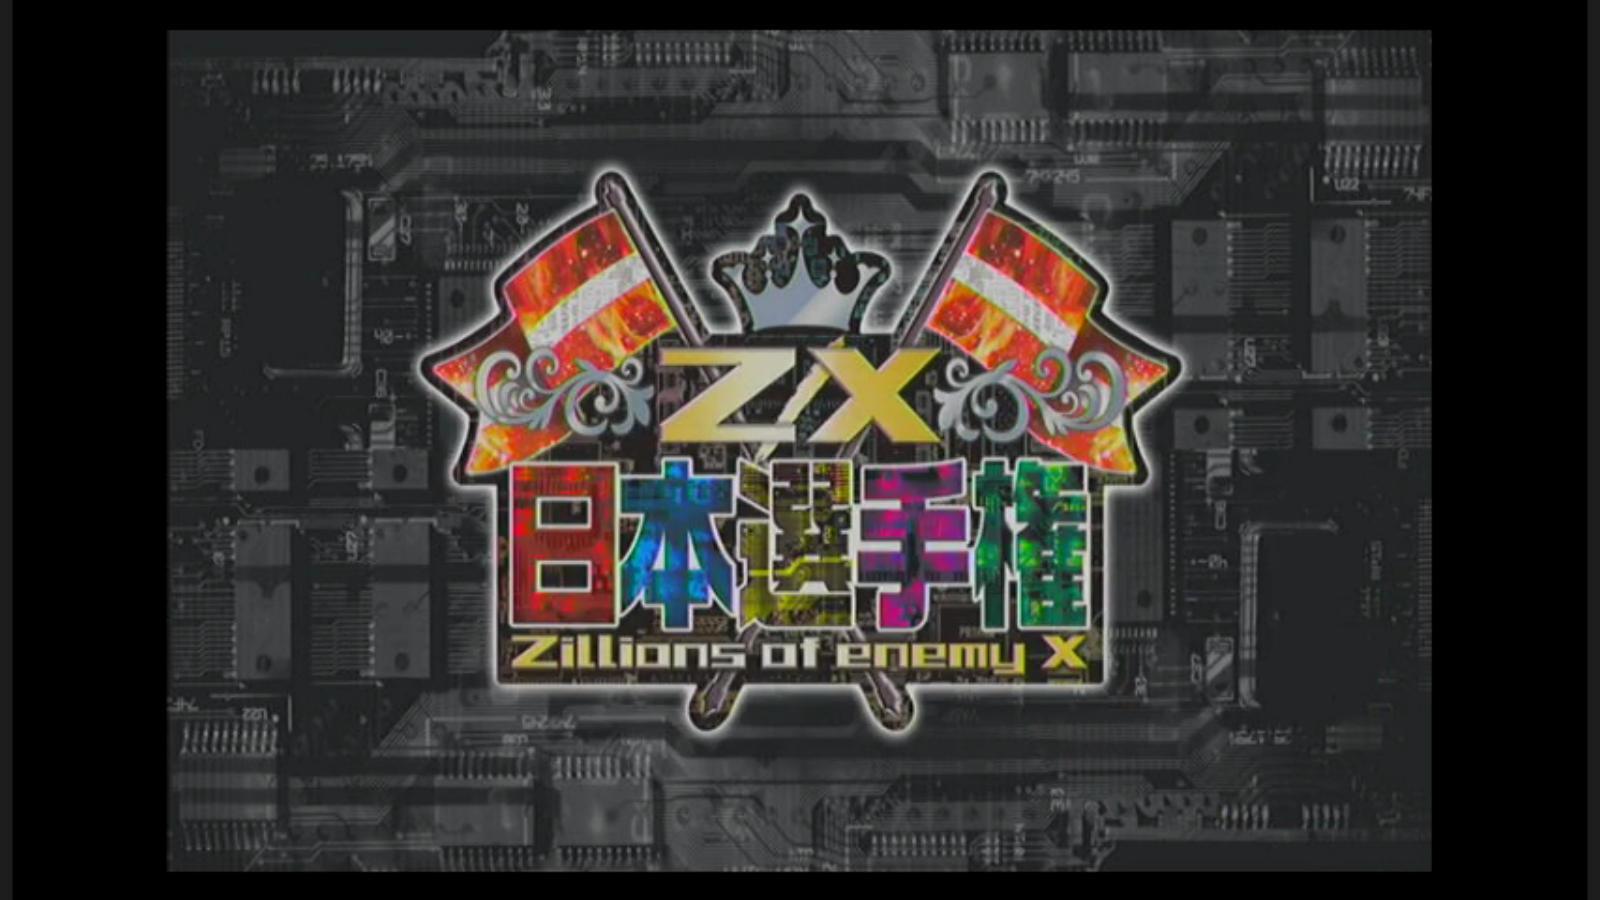 zx-zxtreme-2017spring-20170312-034.jpg